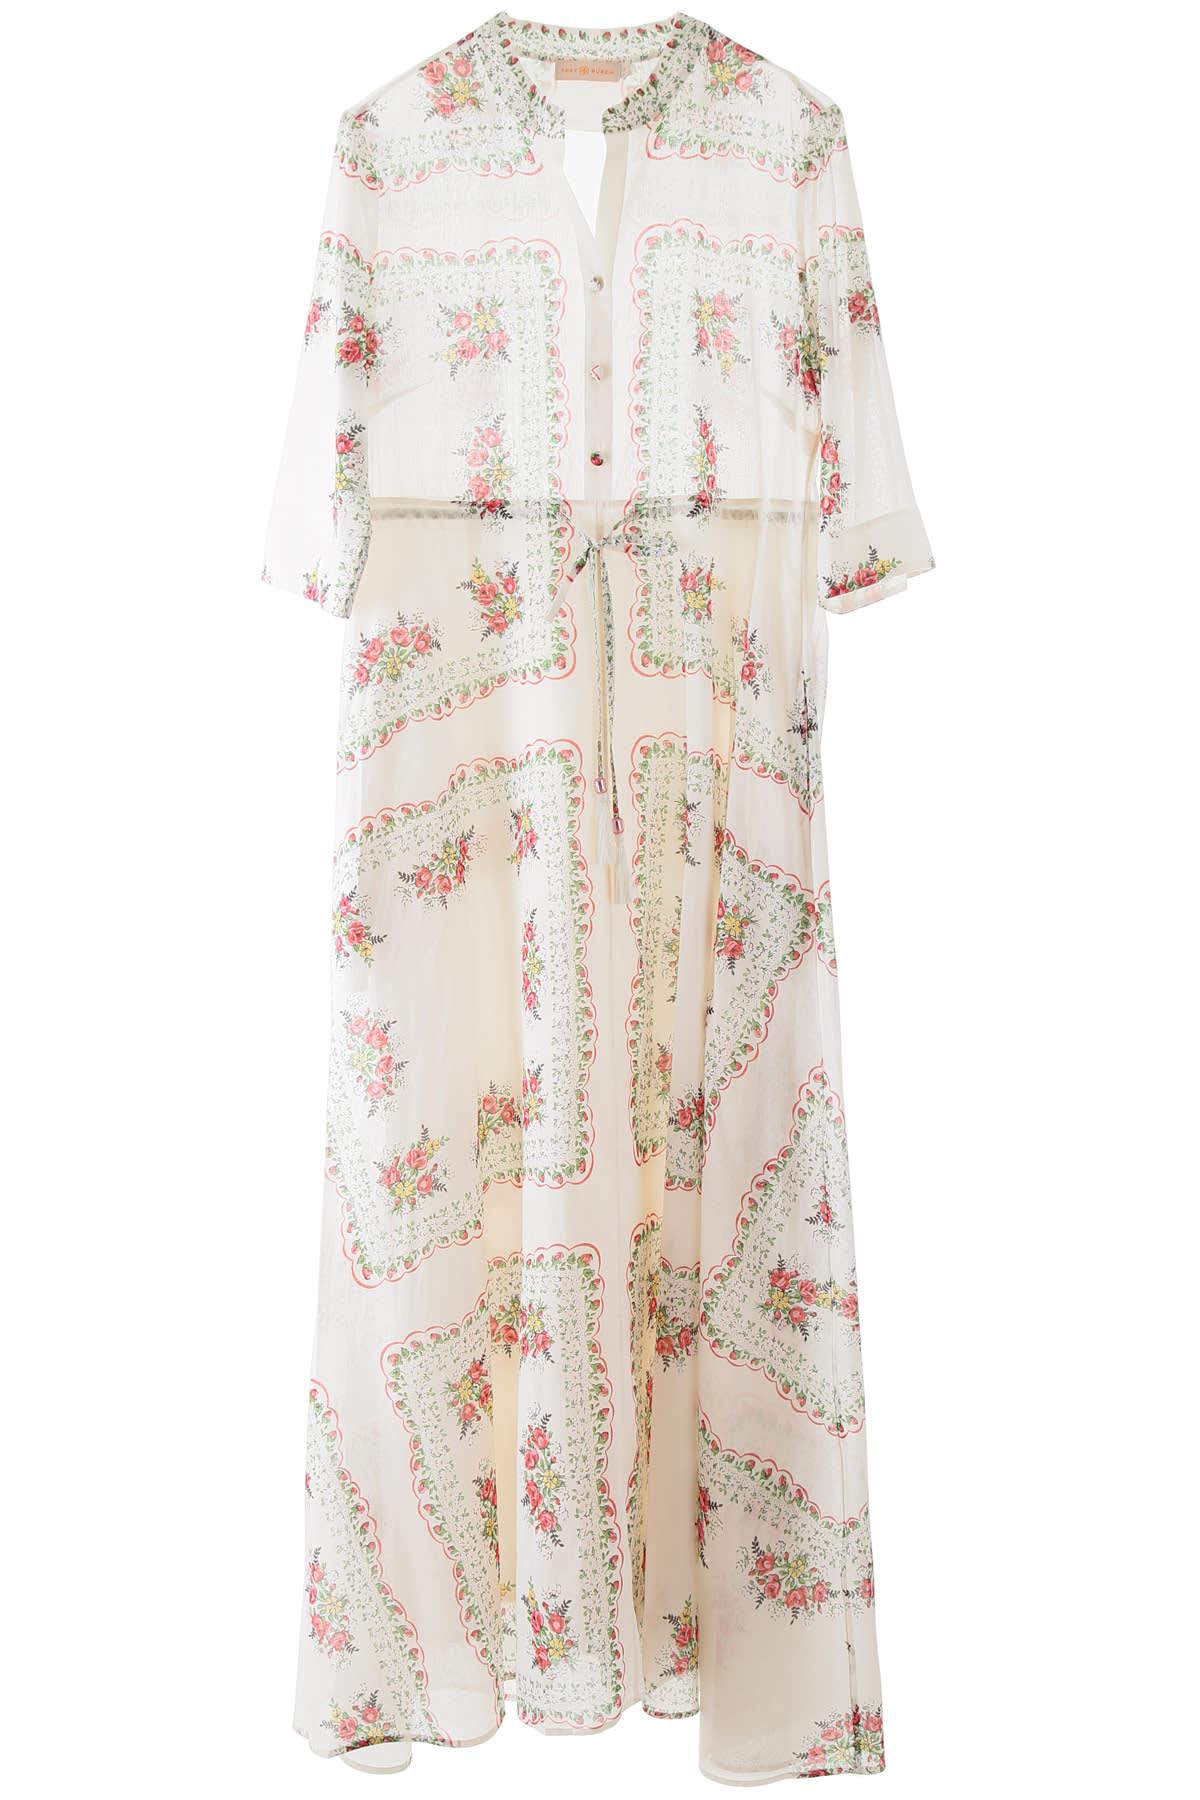 Buy Tory Burch Printed Shirt Dress online, shop Tory Burch with free shipping